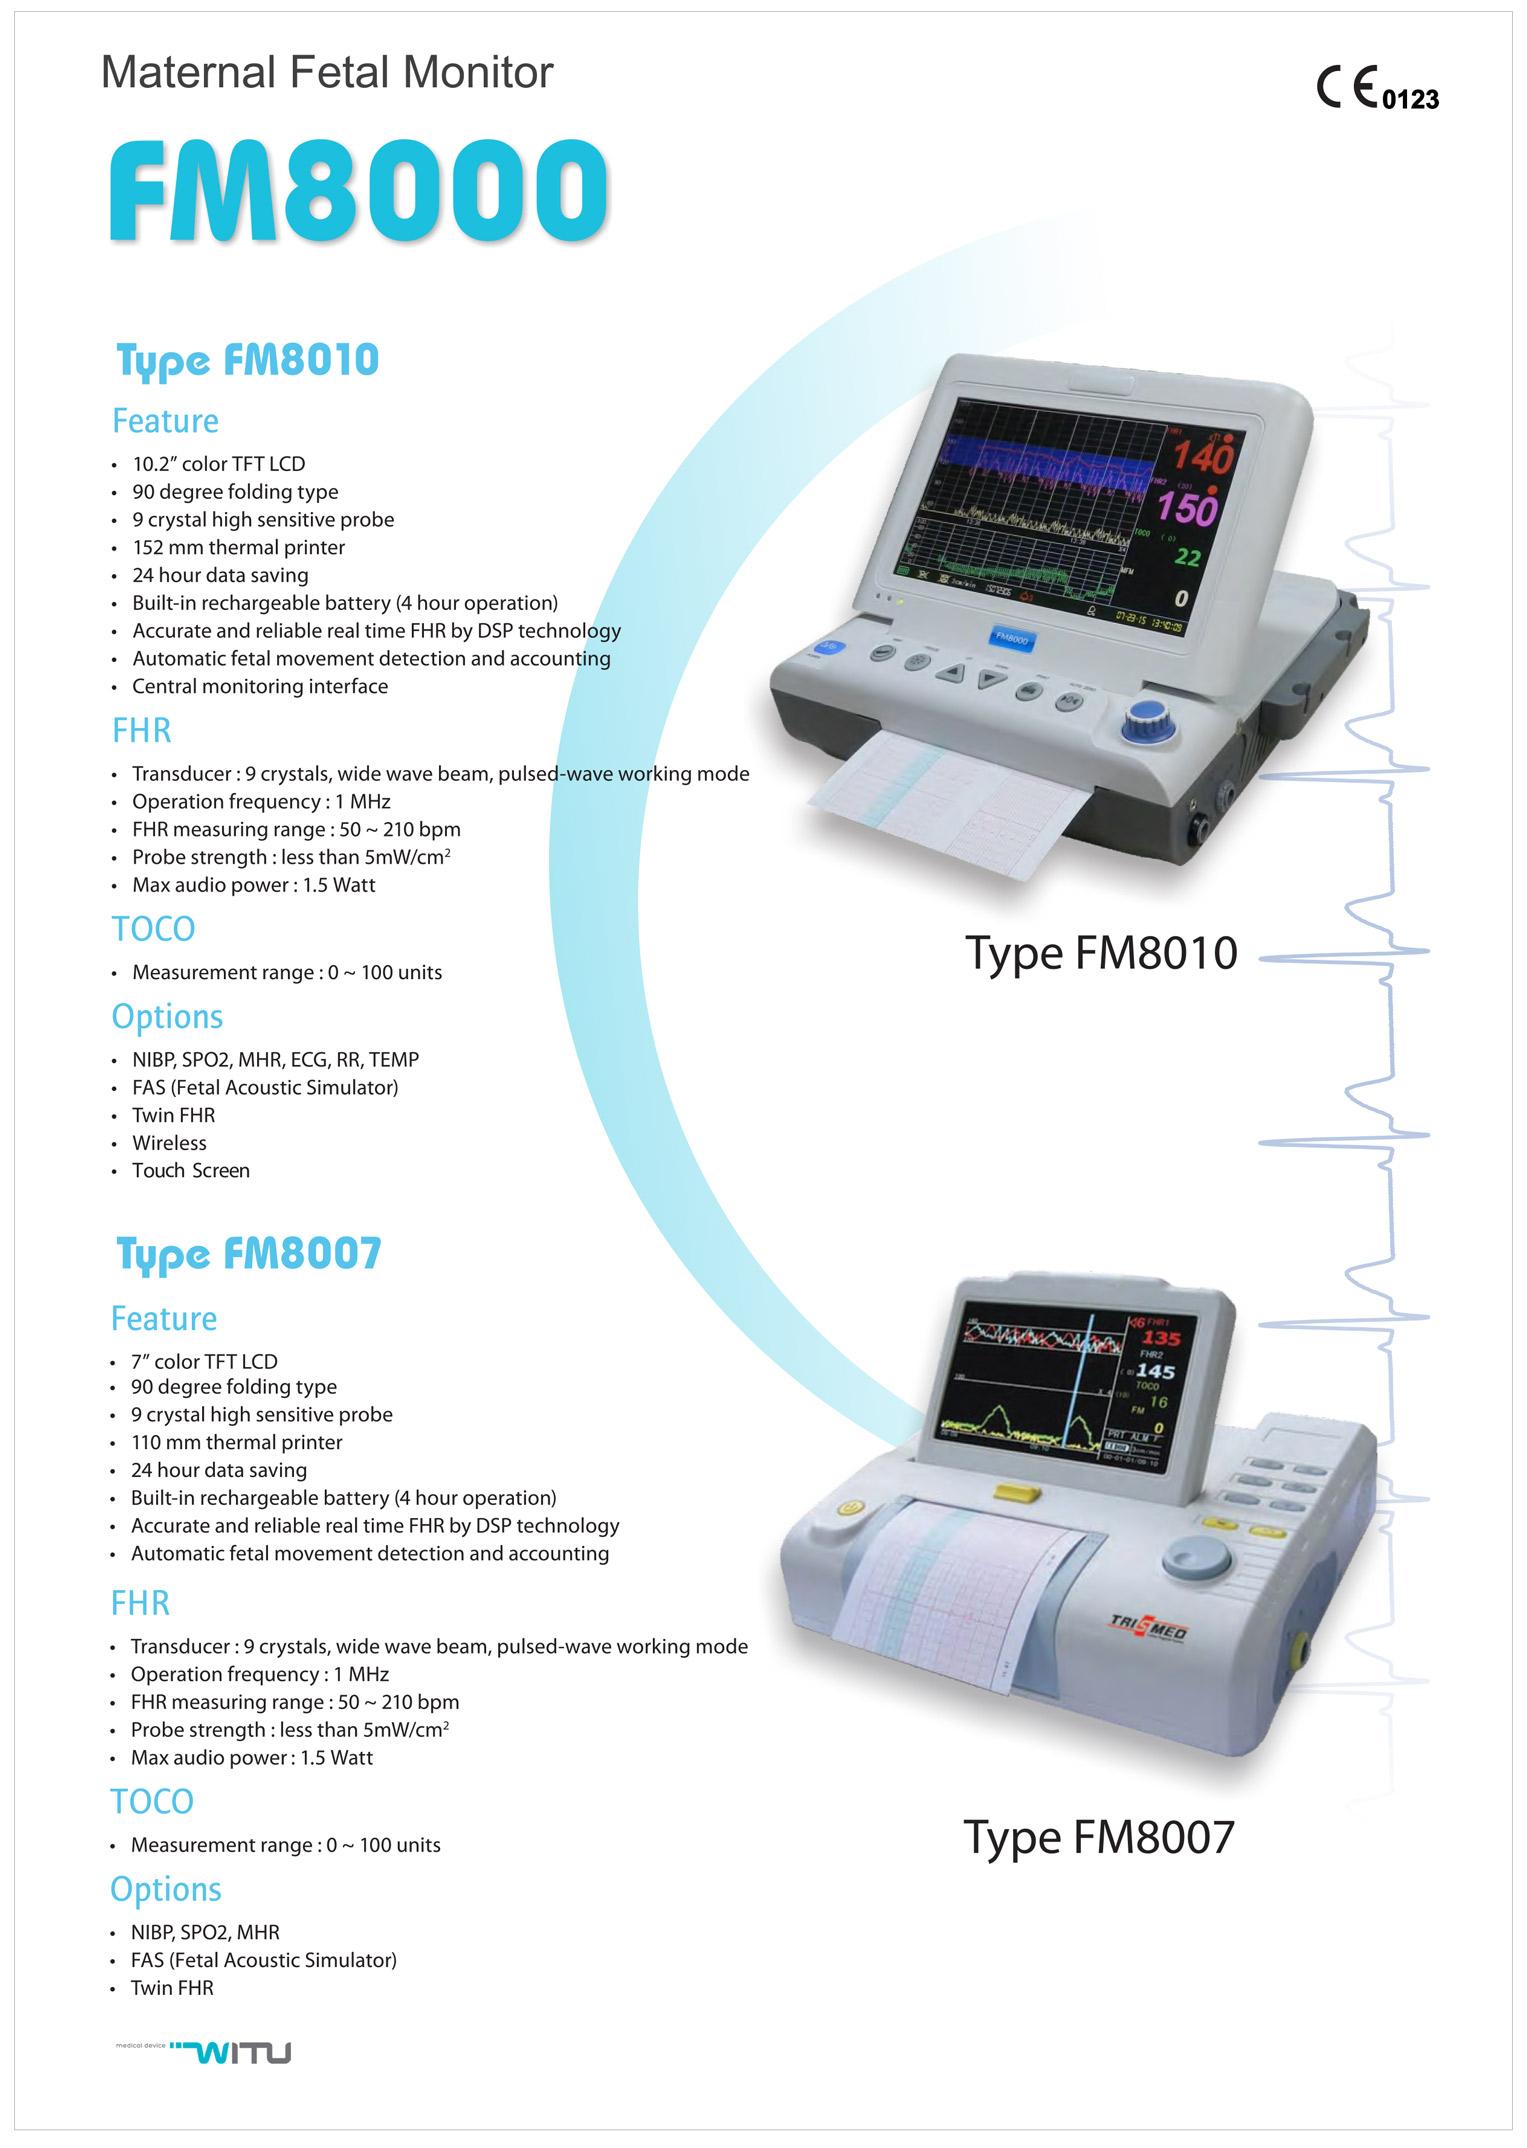 FM8000_s.jpg